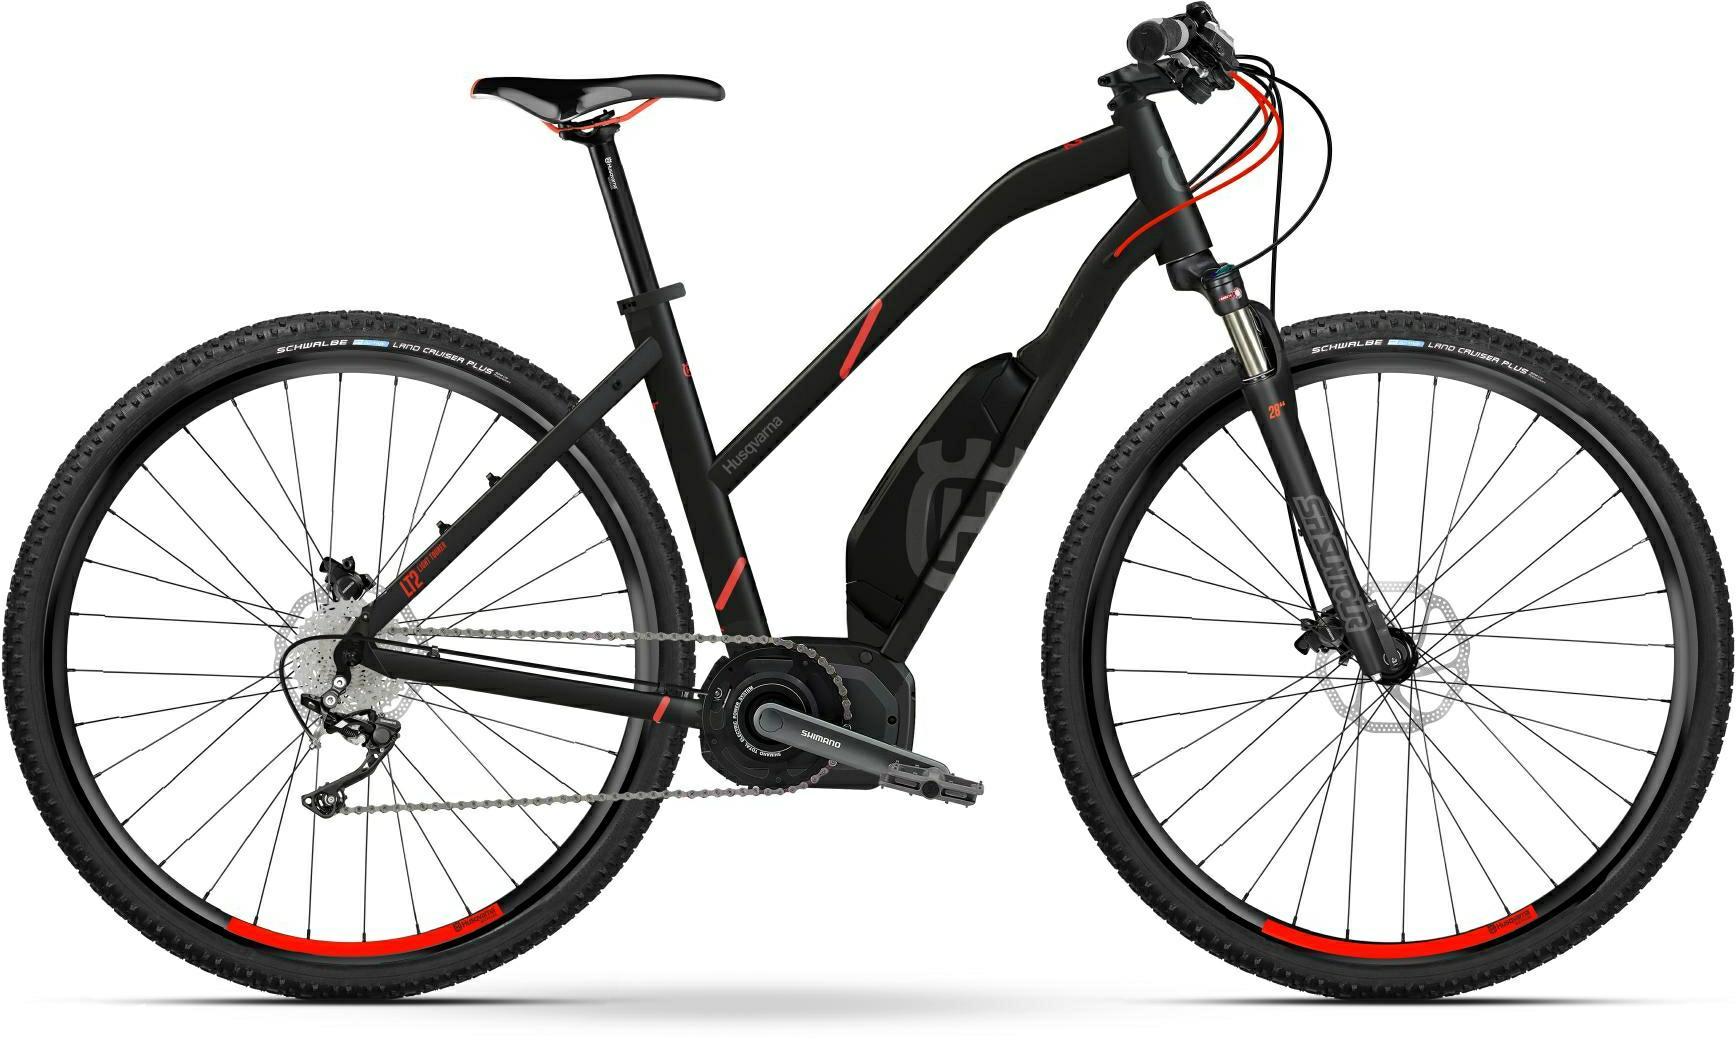 Husqvarna Cross Tourer CT2 e-Mountainbike, MTB Pedelec 2018 schwarz/rot Trapezrahmen